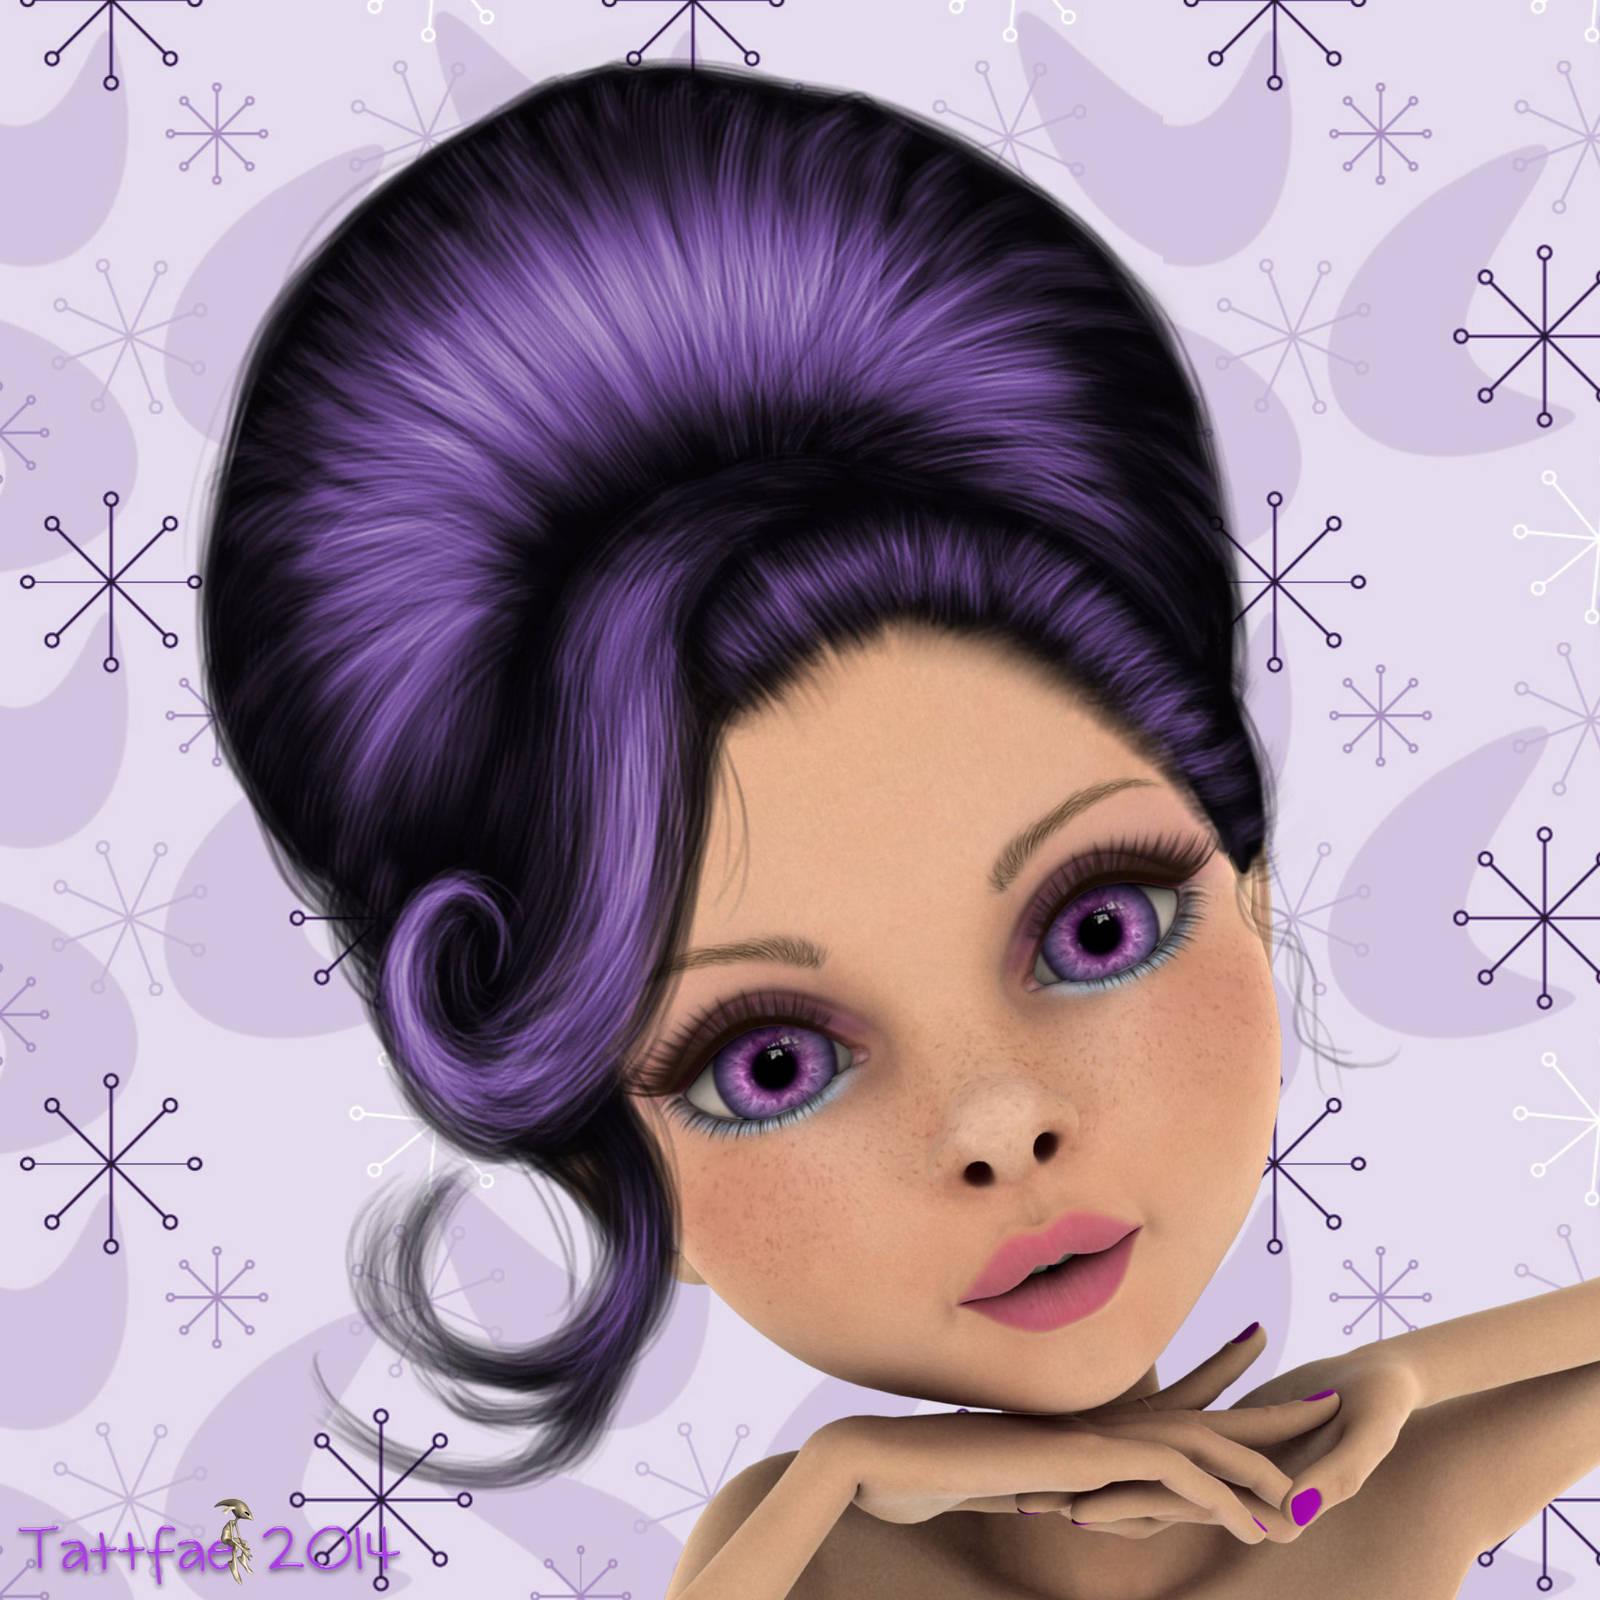 tattfae's Profile Picture